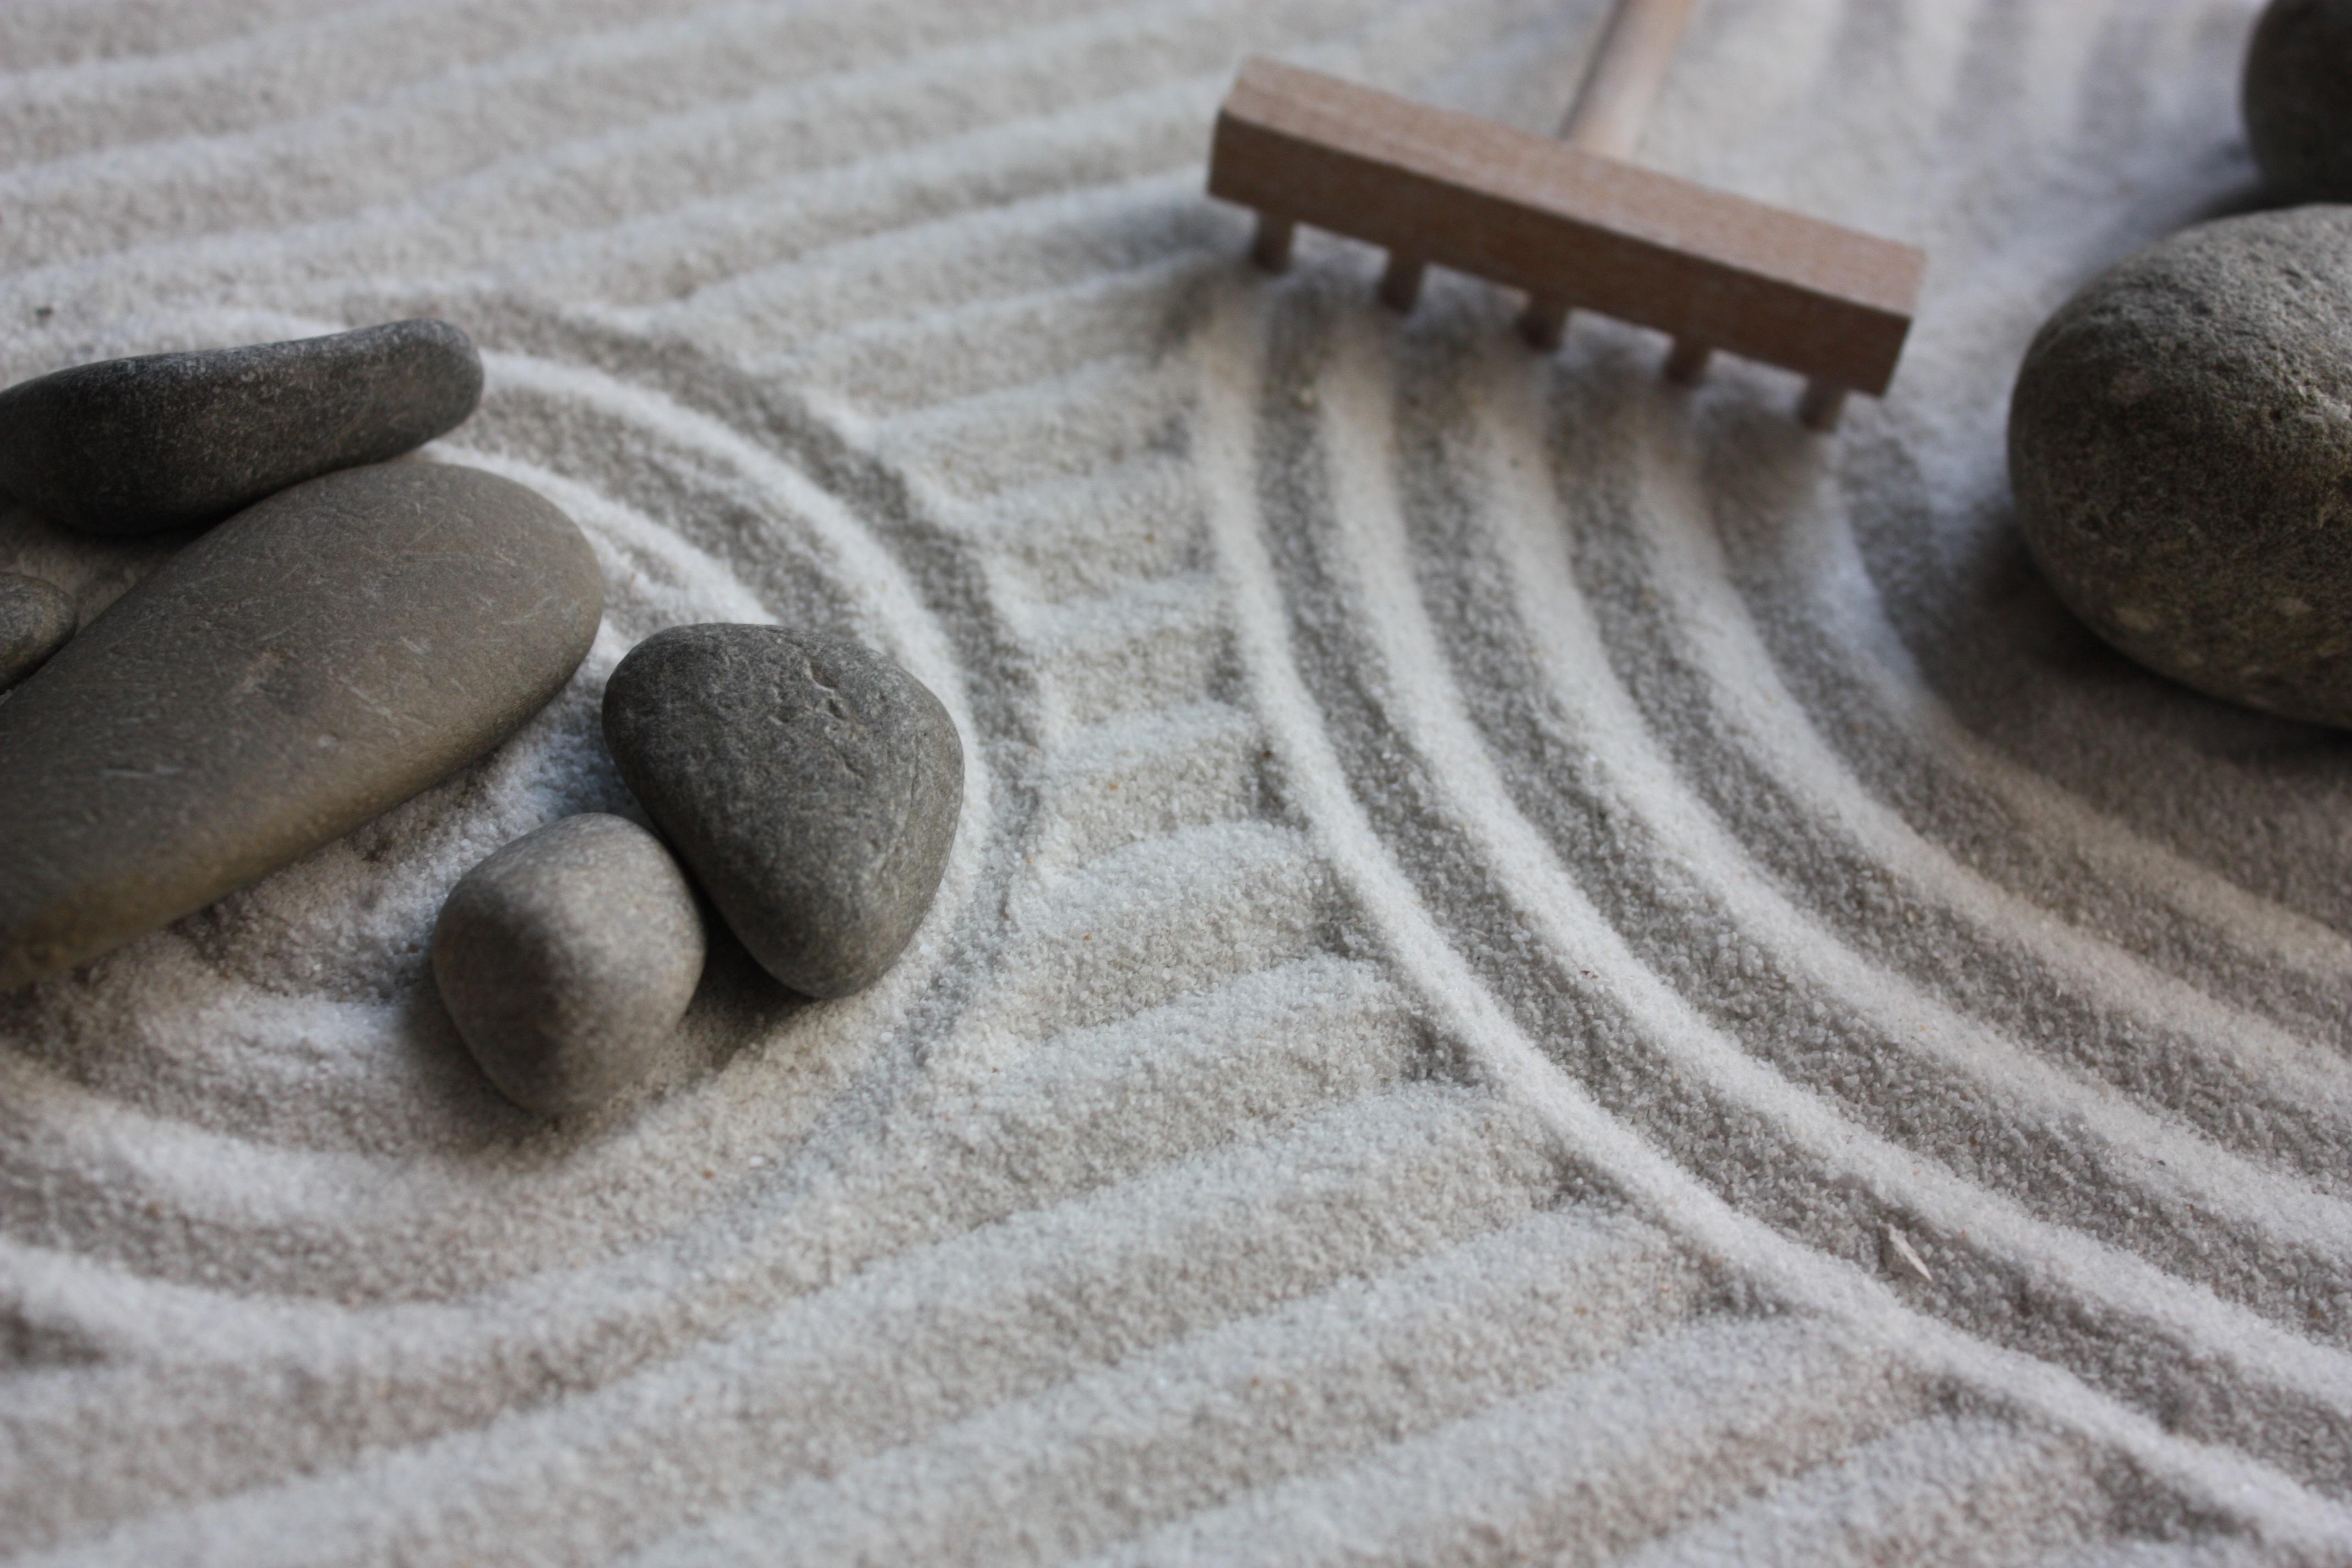 Fotos gratis arena madera piso jard n jap n - Arena jardin zen ...